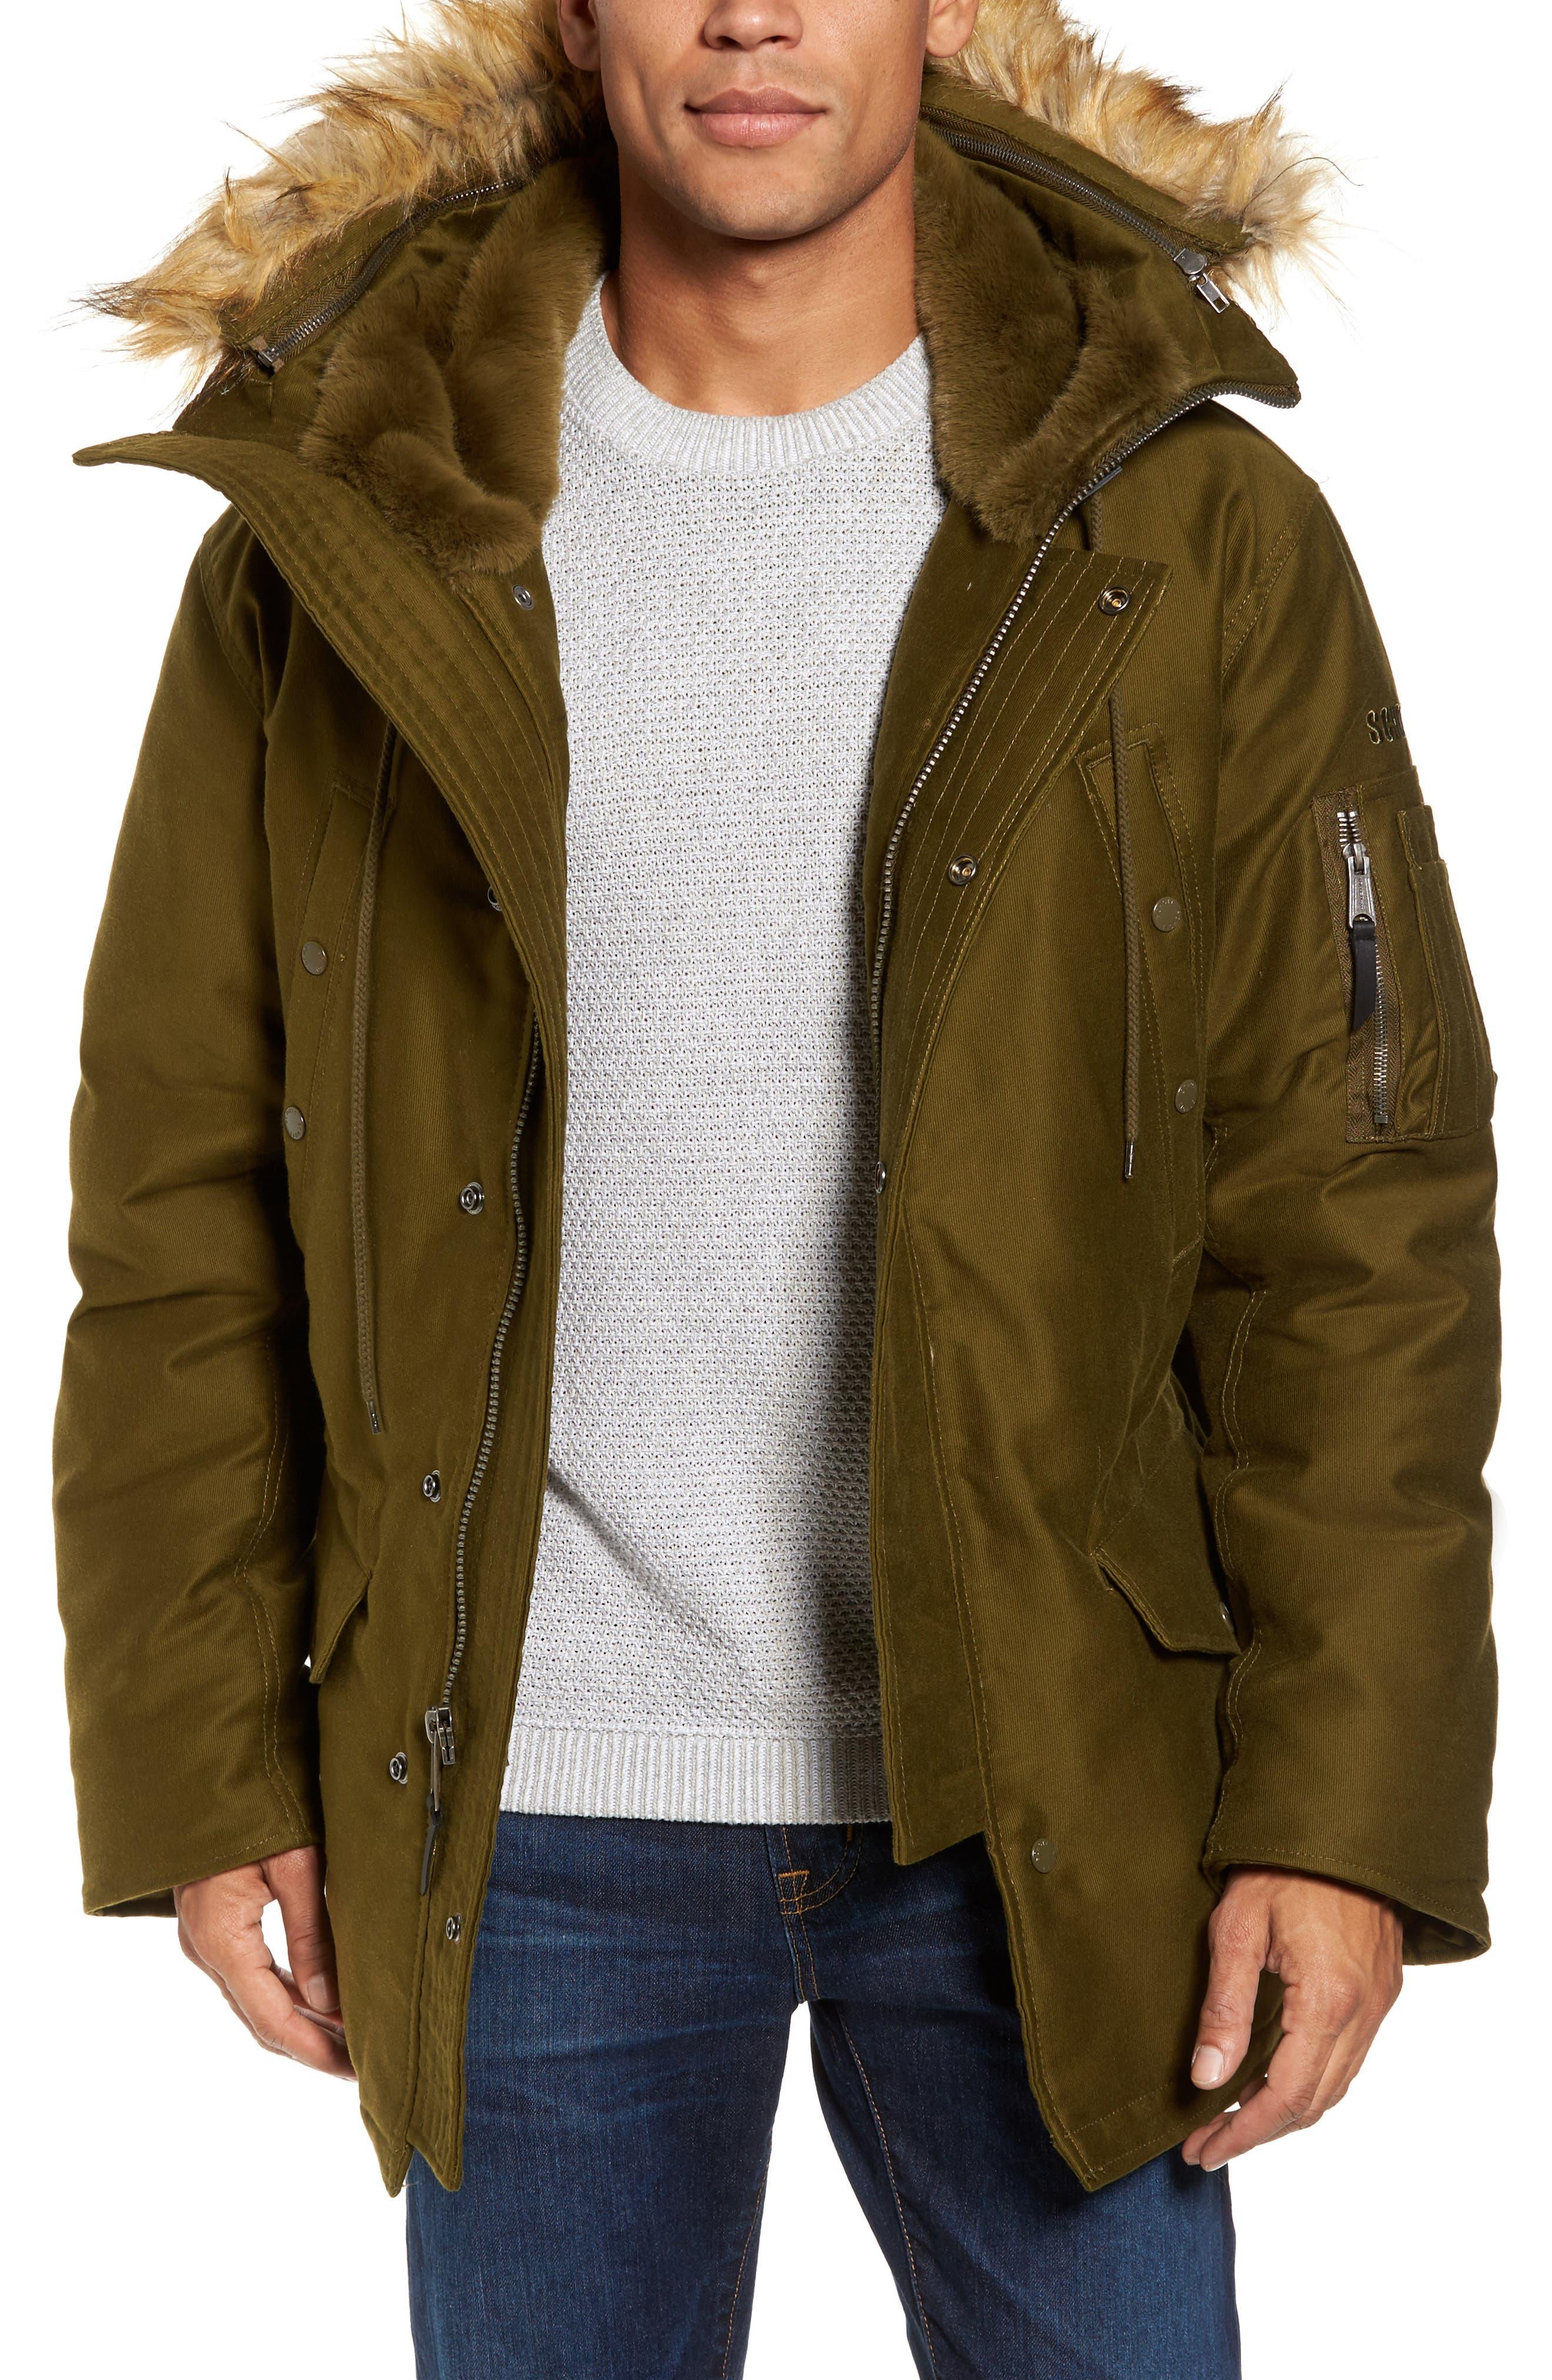 Bedford Corduroy Goose Down Jacket with Faux Fur Trim,                             Main thumbnail 1, color,                             352